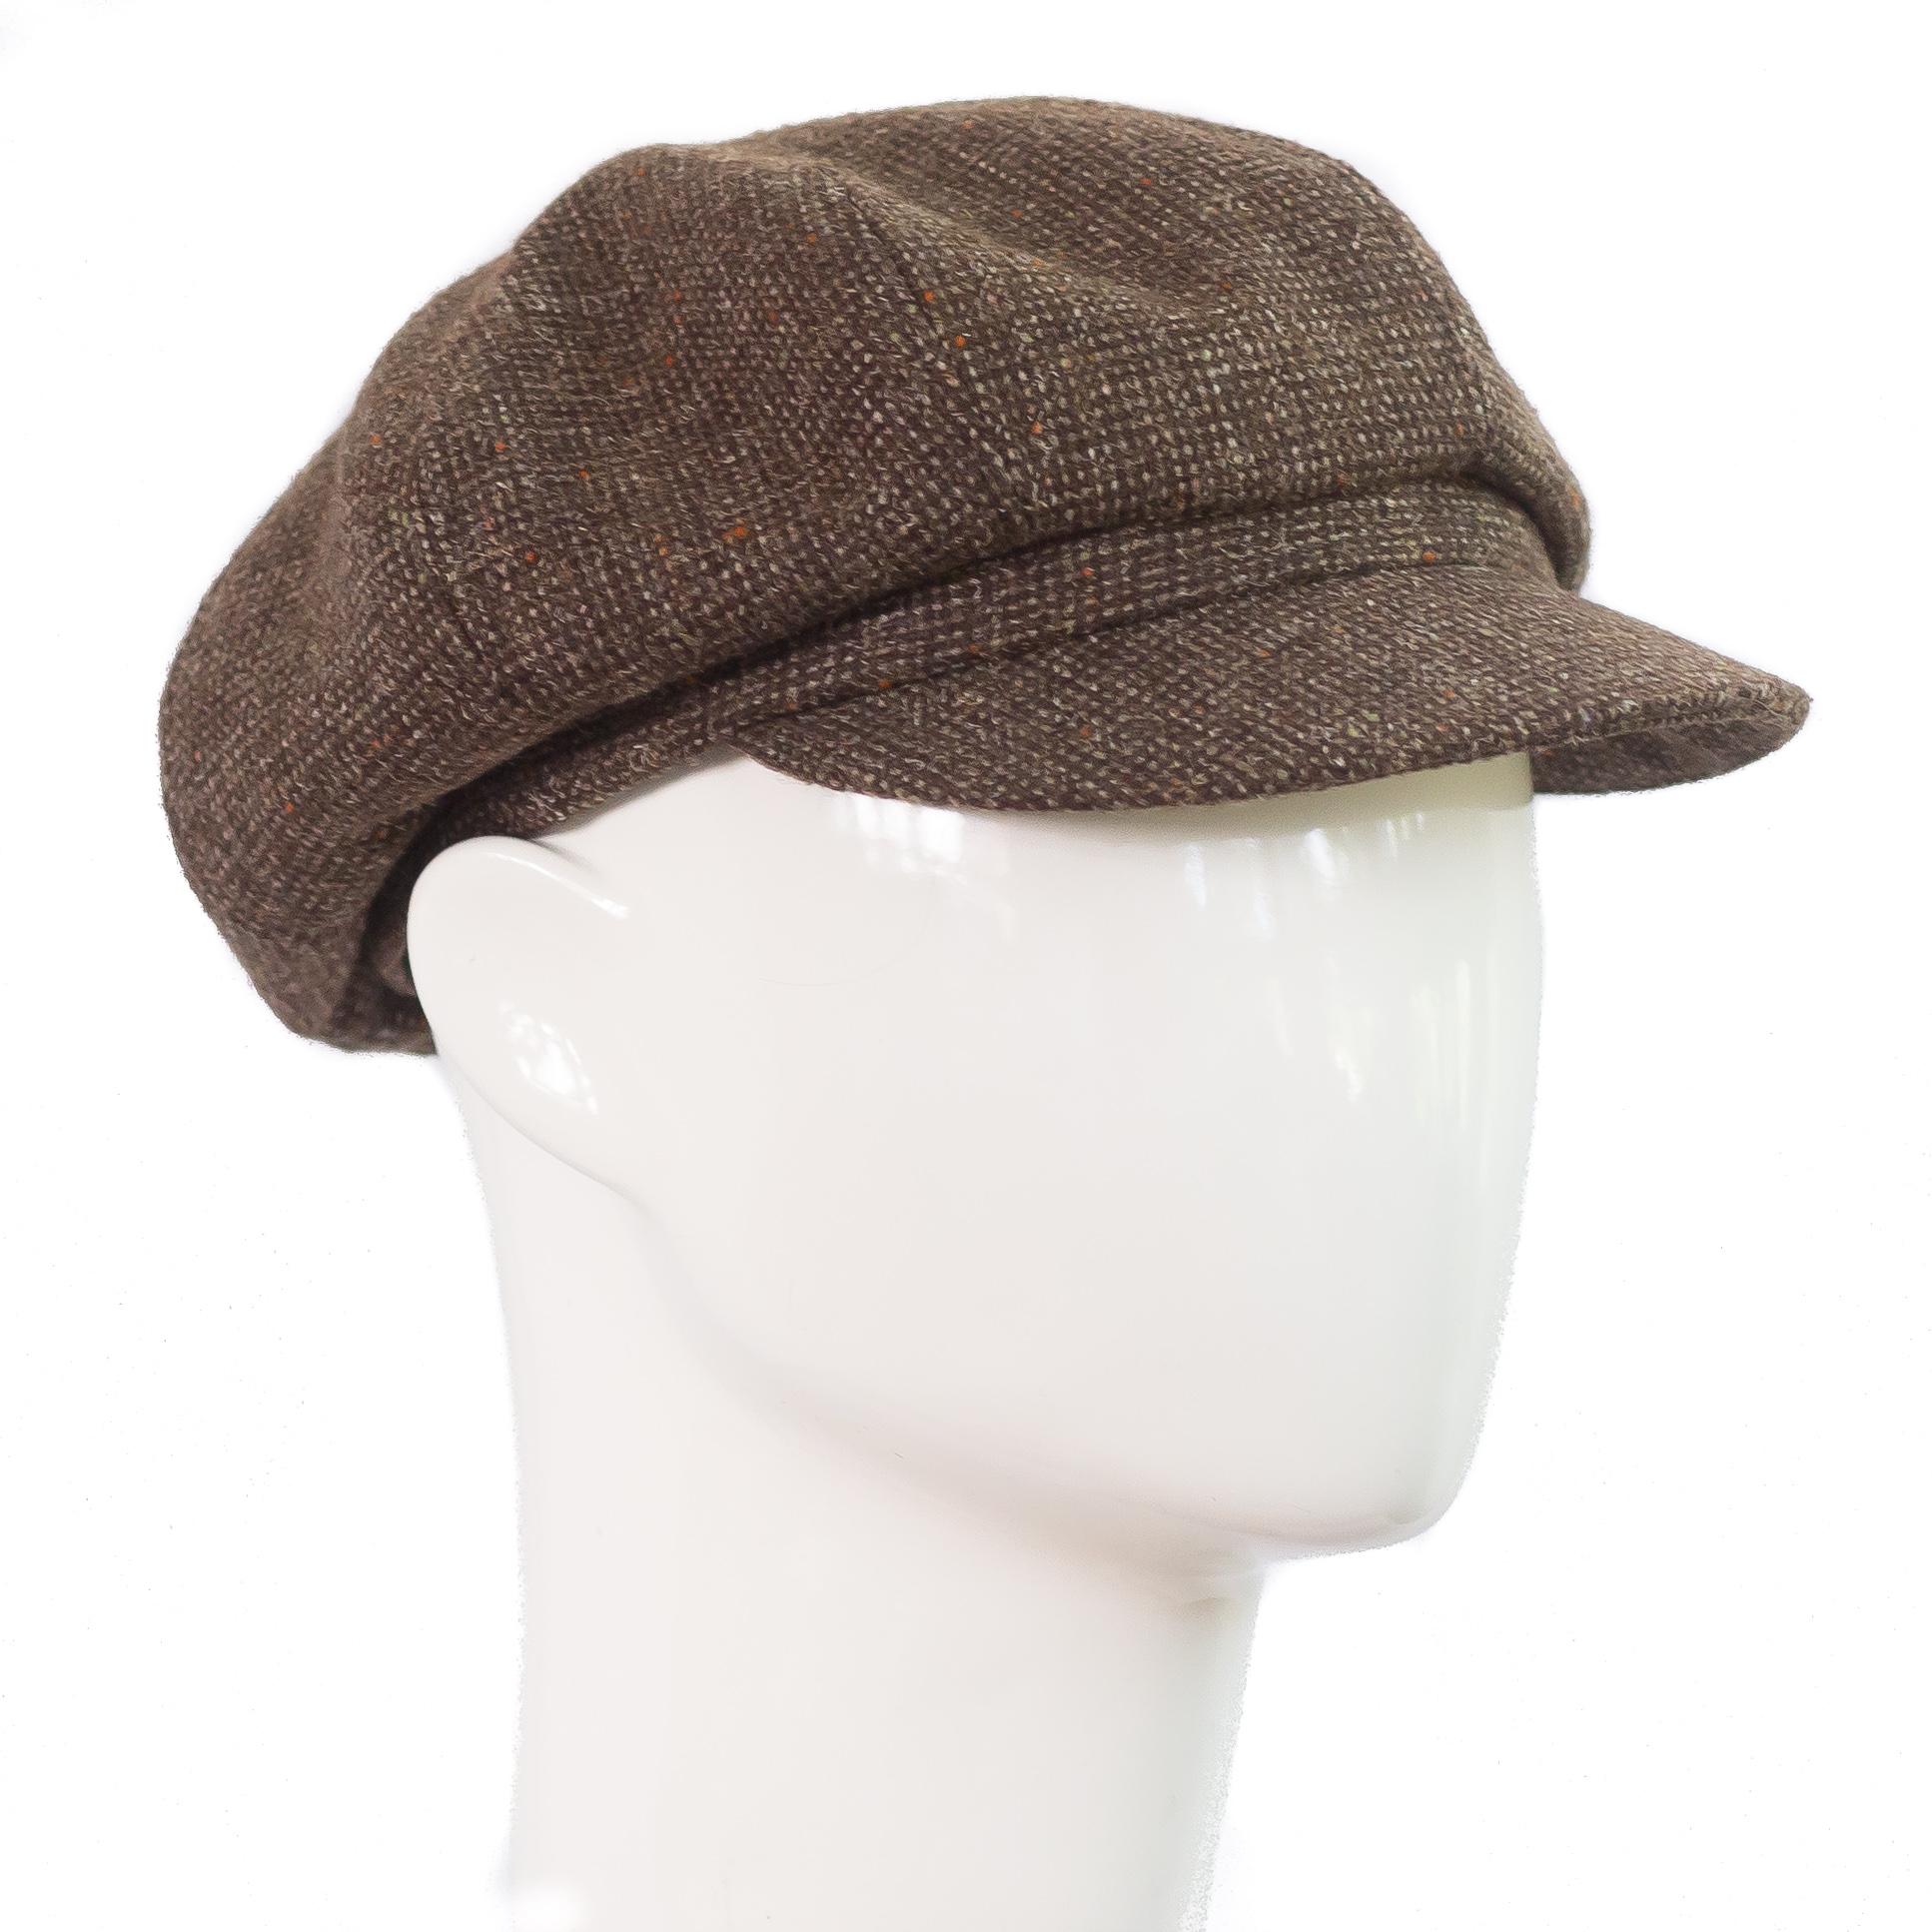 Katupoika-lakki-ruskea donegal tweed newsboy helsinki hat factory